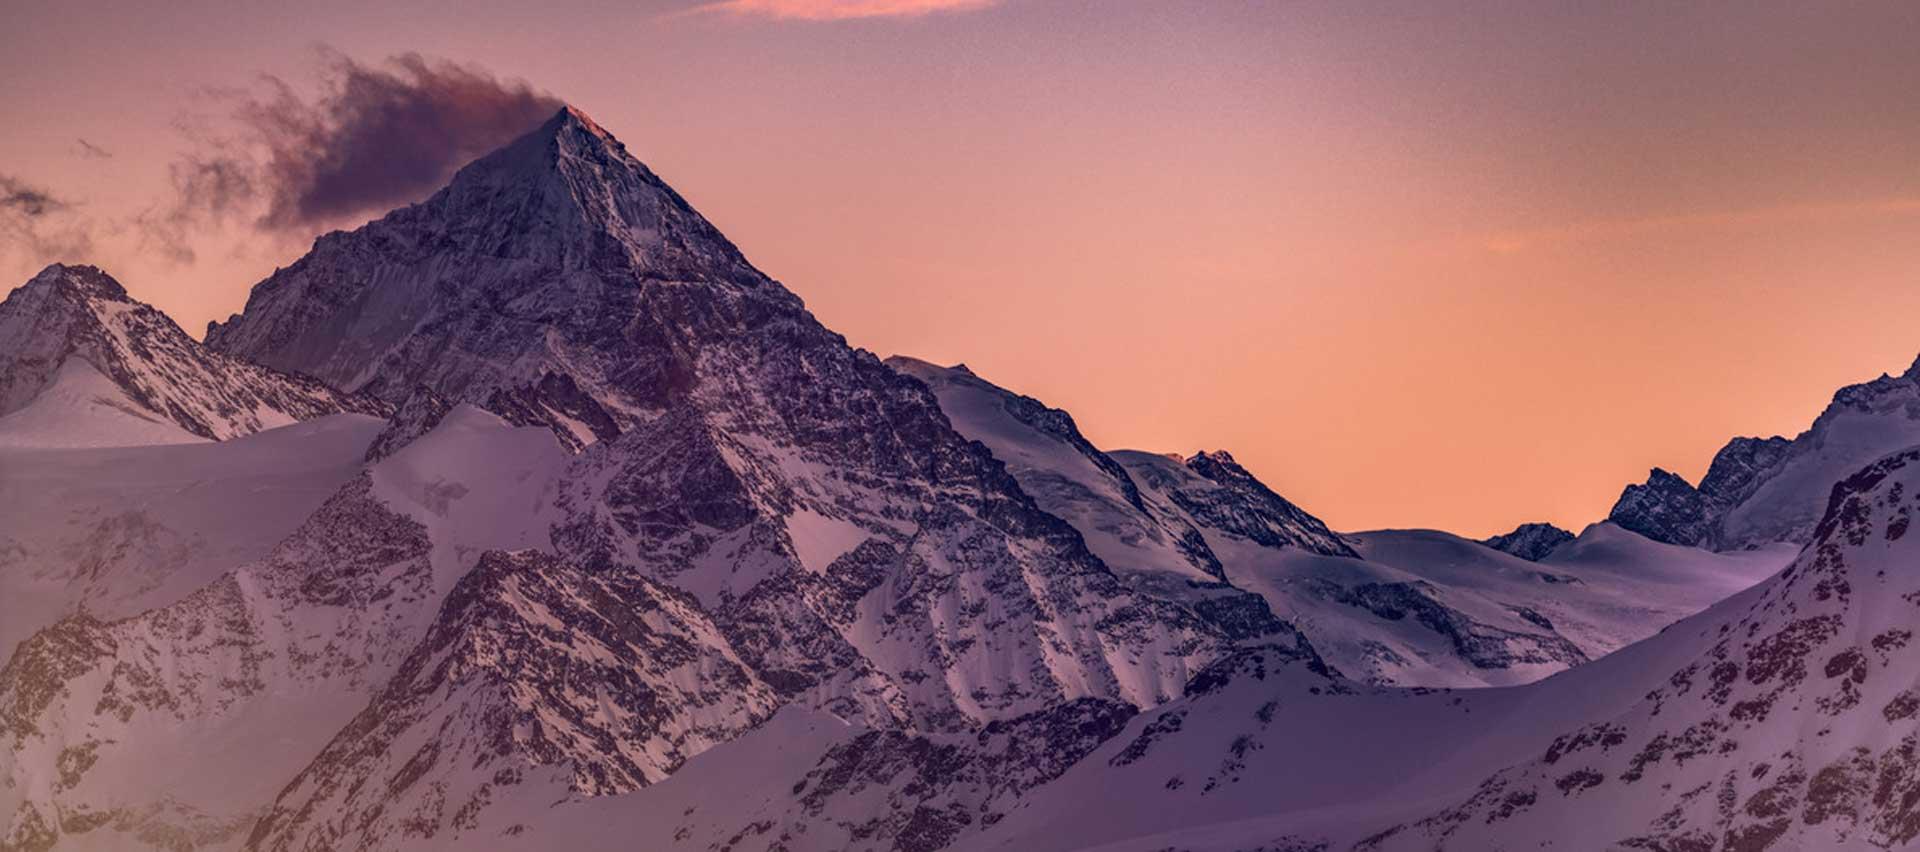 Luxury-Guided-Mountain-Travel-with-Swiss-Ski-Safari-winter